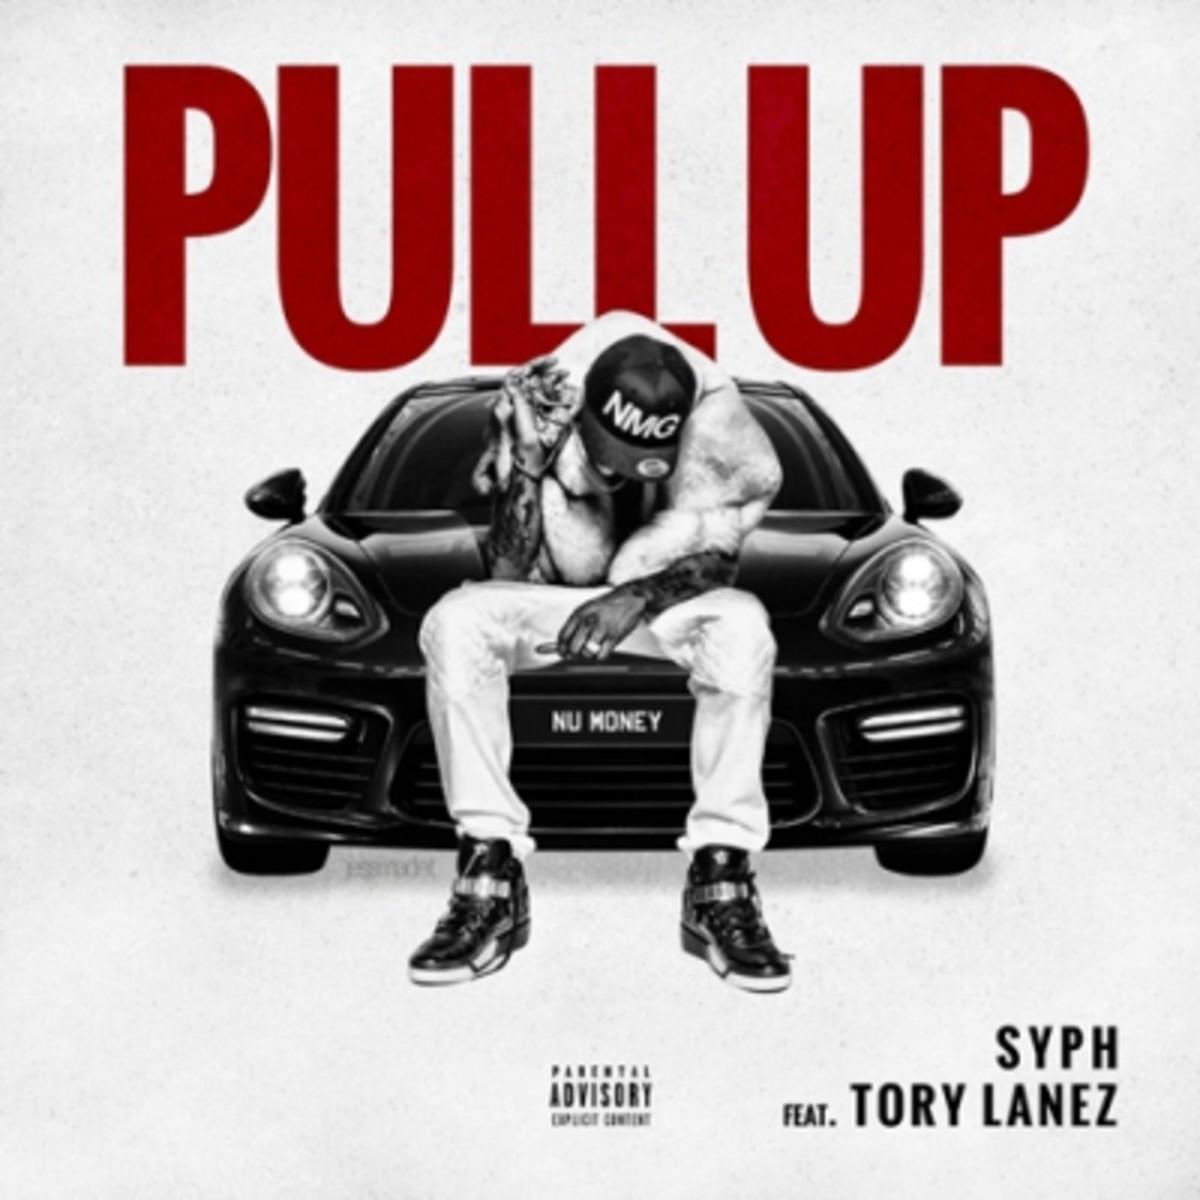 syph-pull-up.jpg